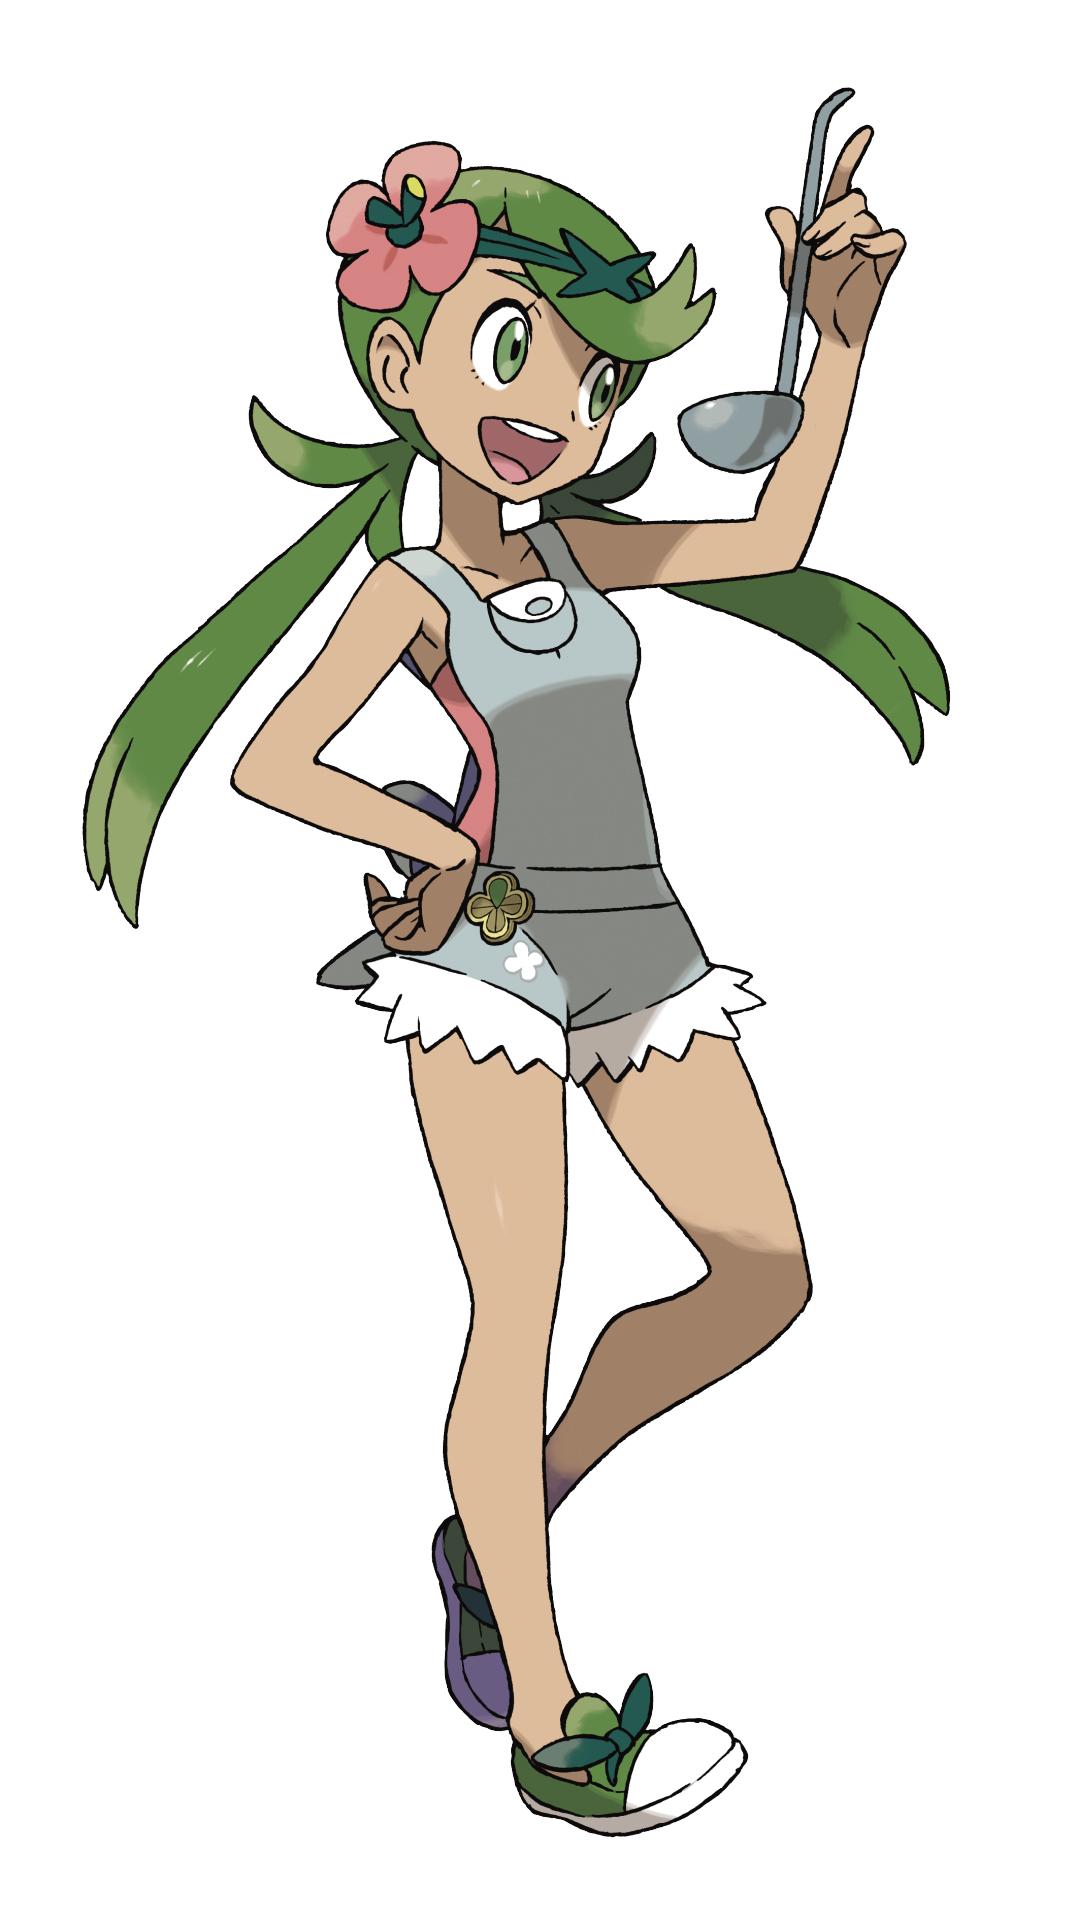 Mao (Pokémon) - Pokémon Sun & Moon - Zerochan Anime Image ...